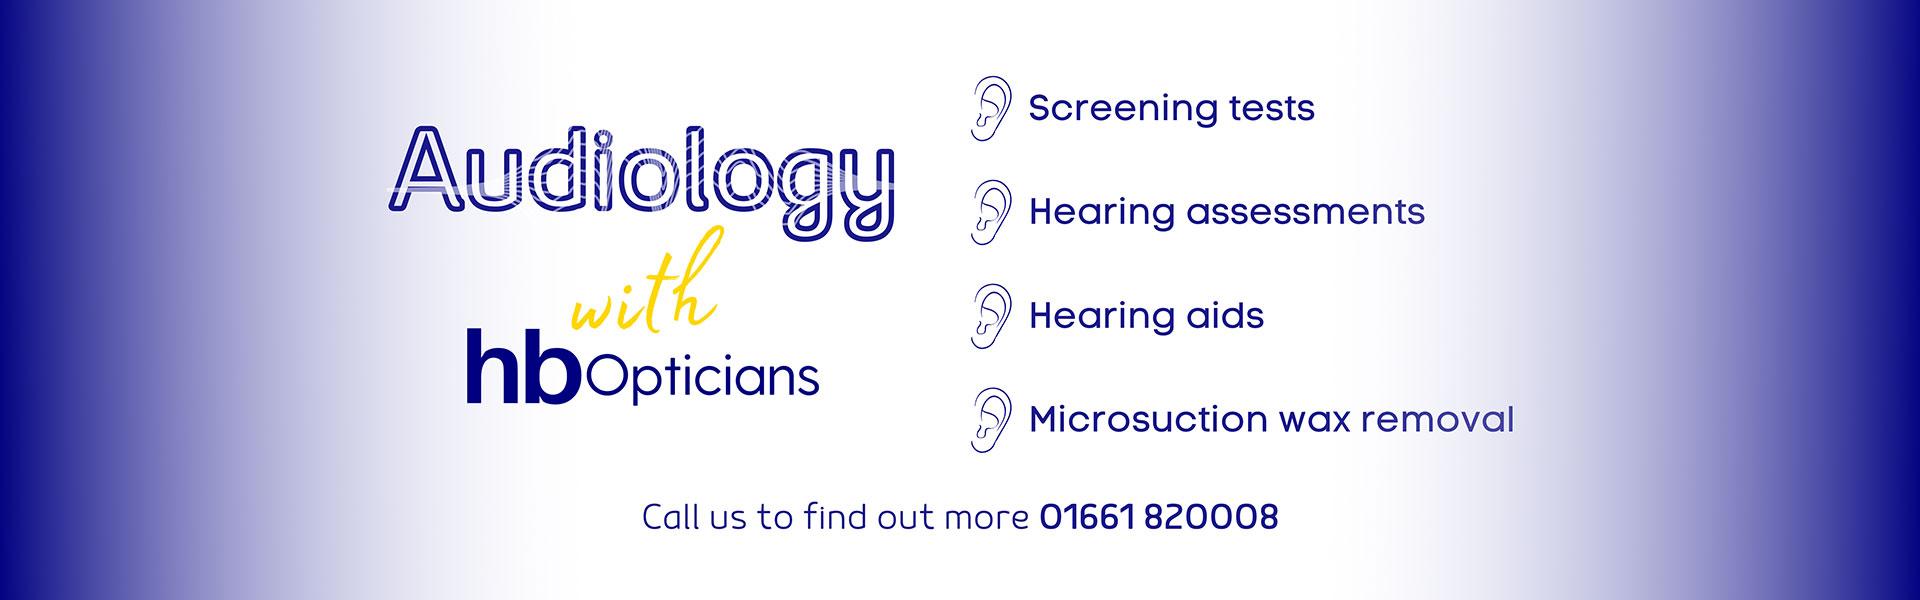 audiology banner